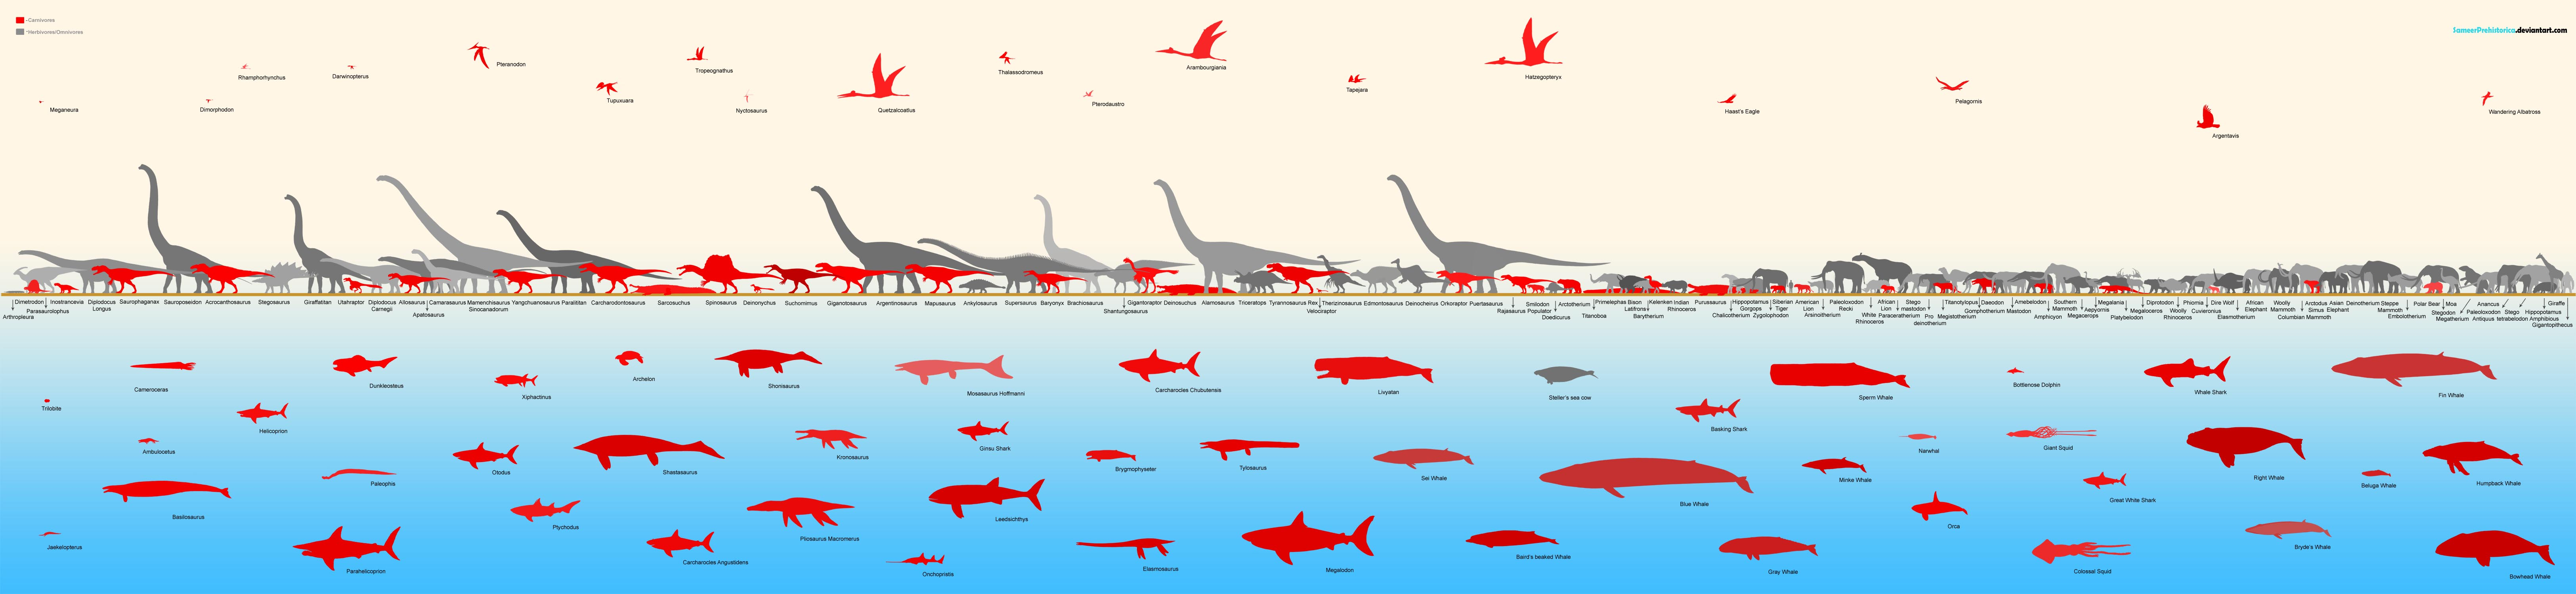 Animals Chart by SameerPrehistorica